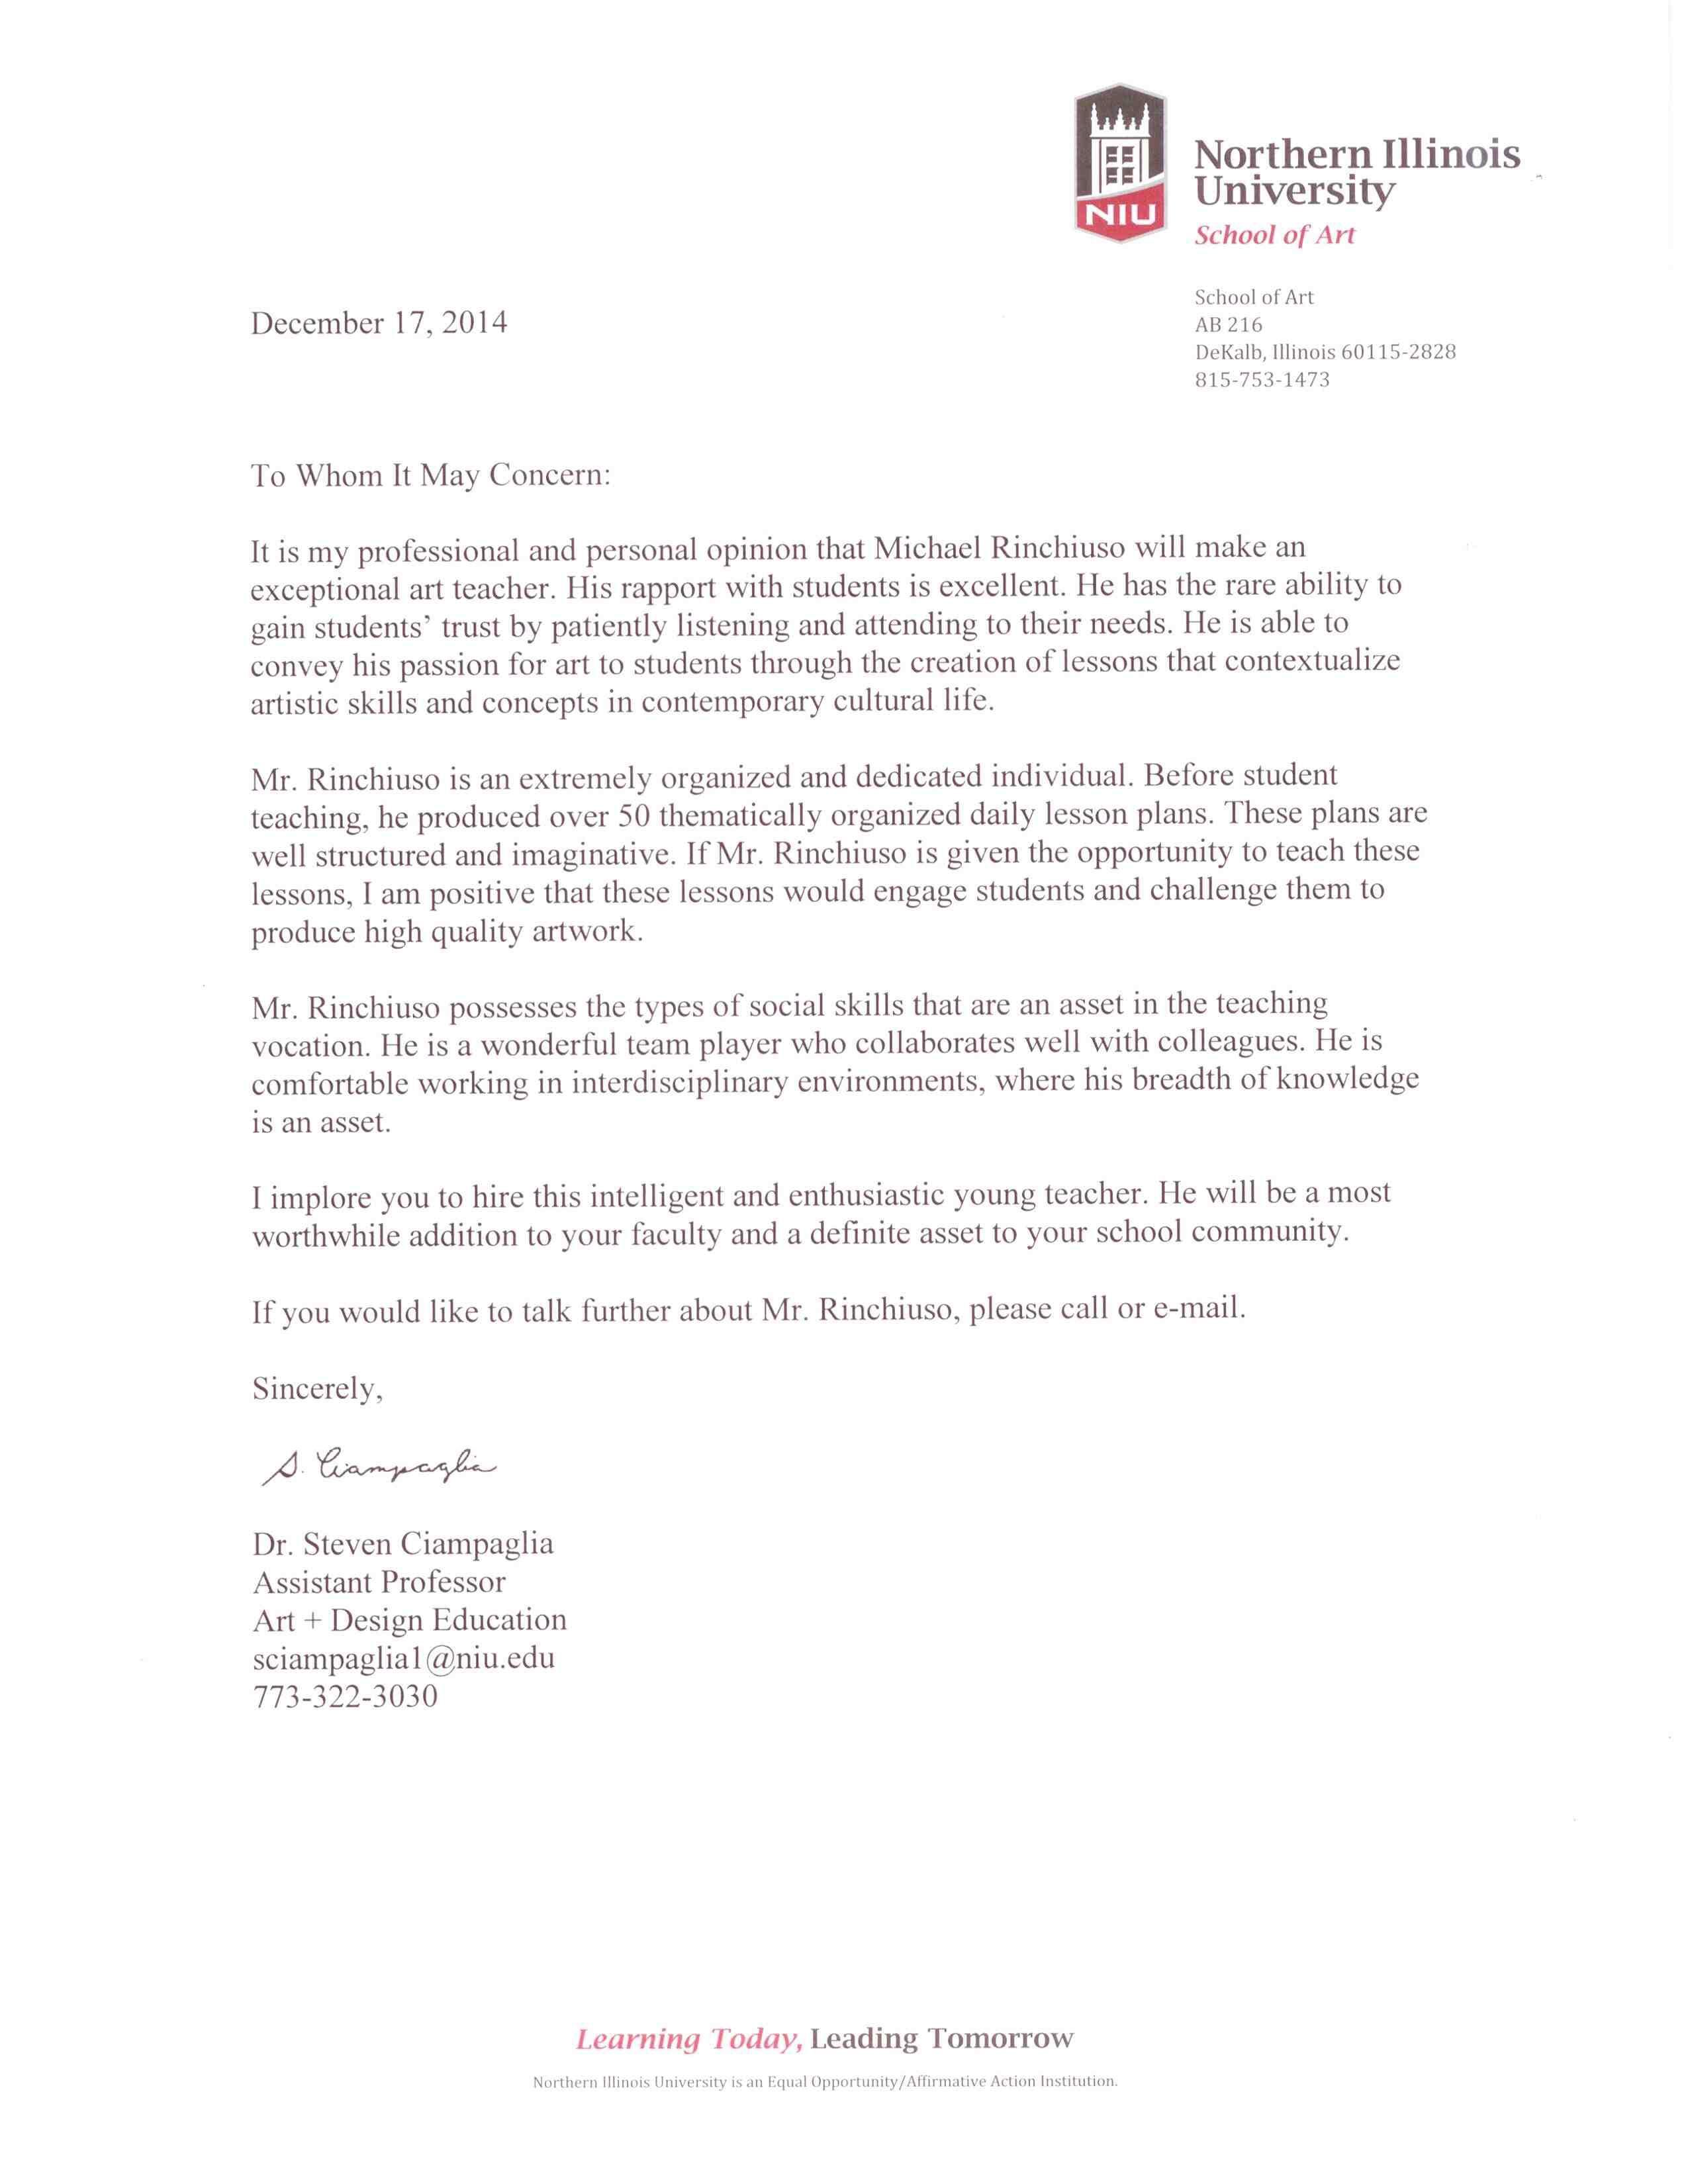 letters of recommendation  u2013 michael ross rinchiuso